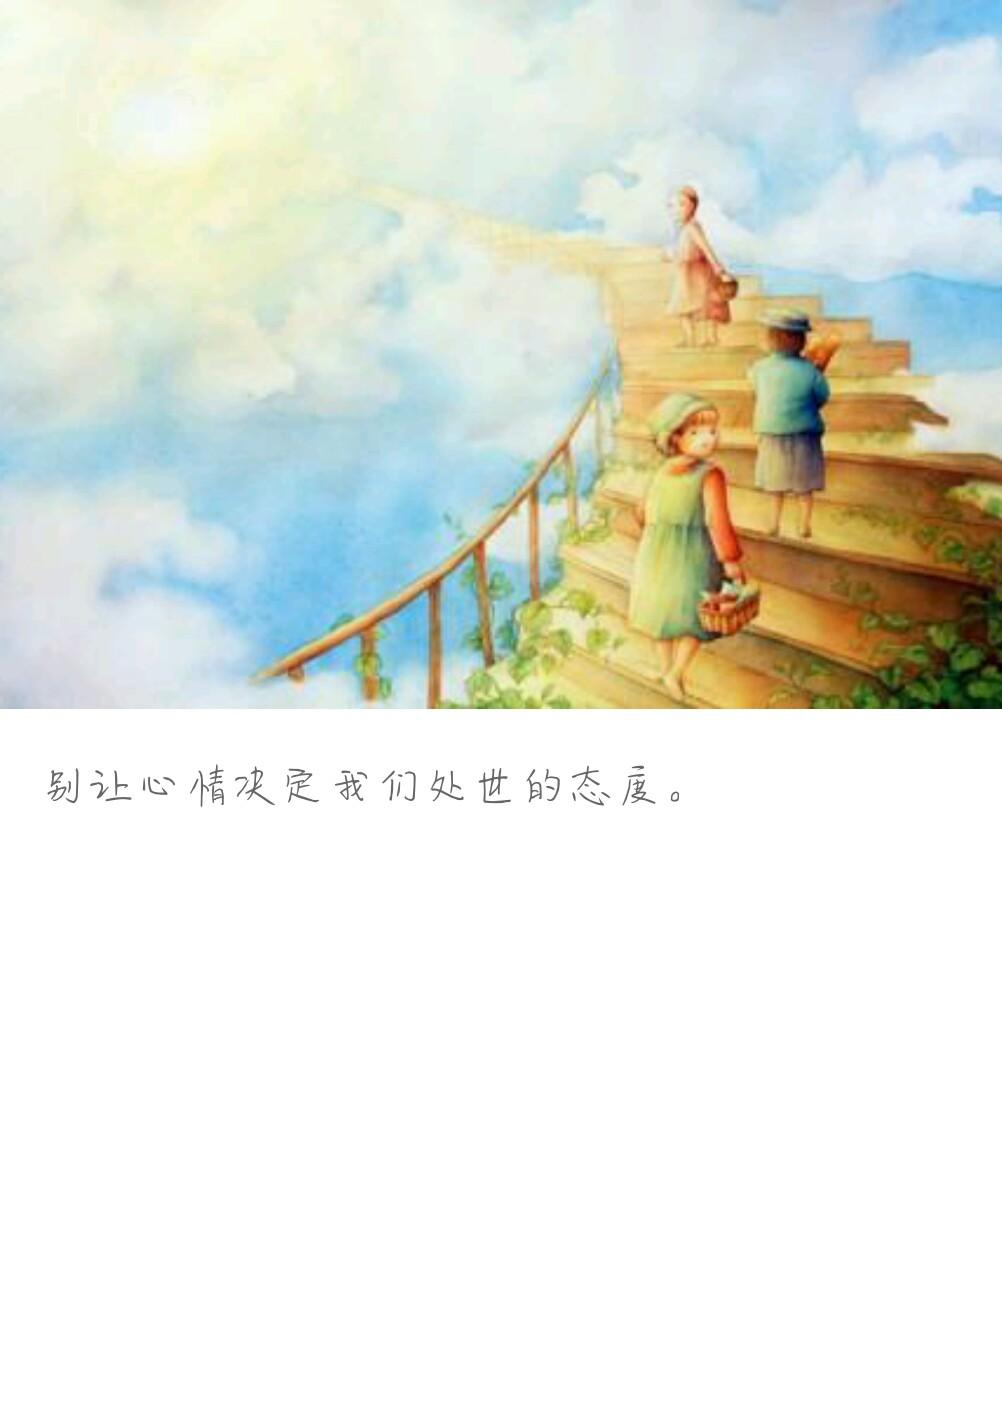 http://www.58100.com/pid/639119.html